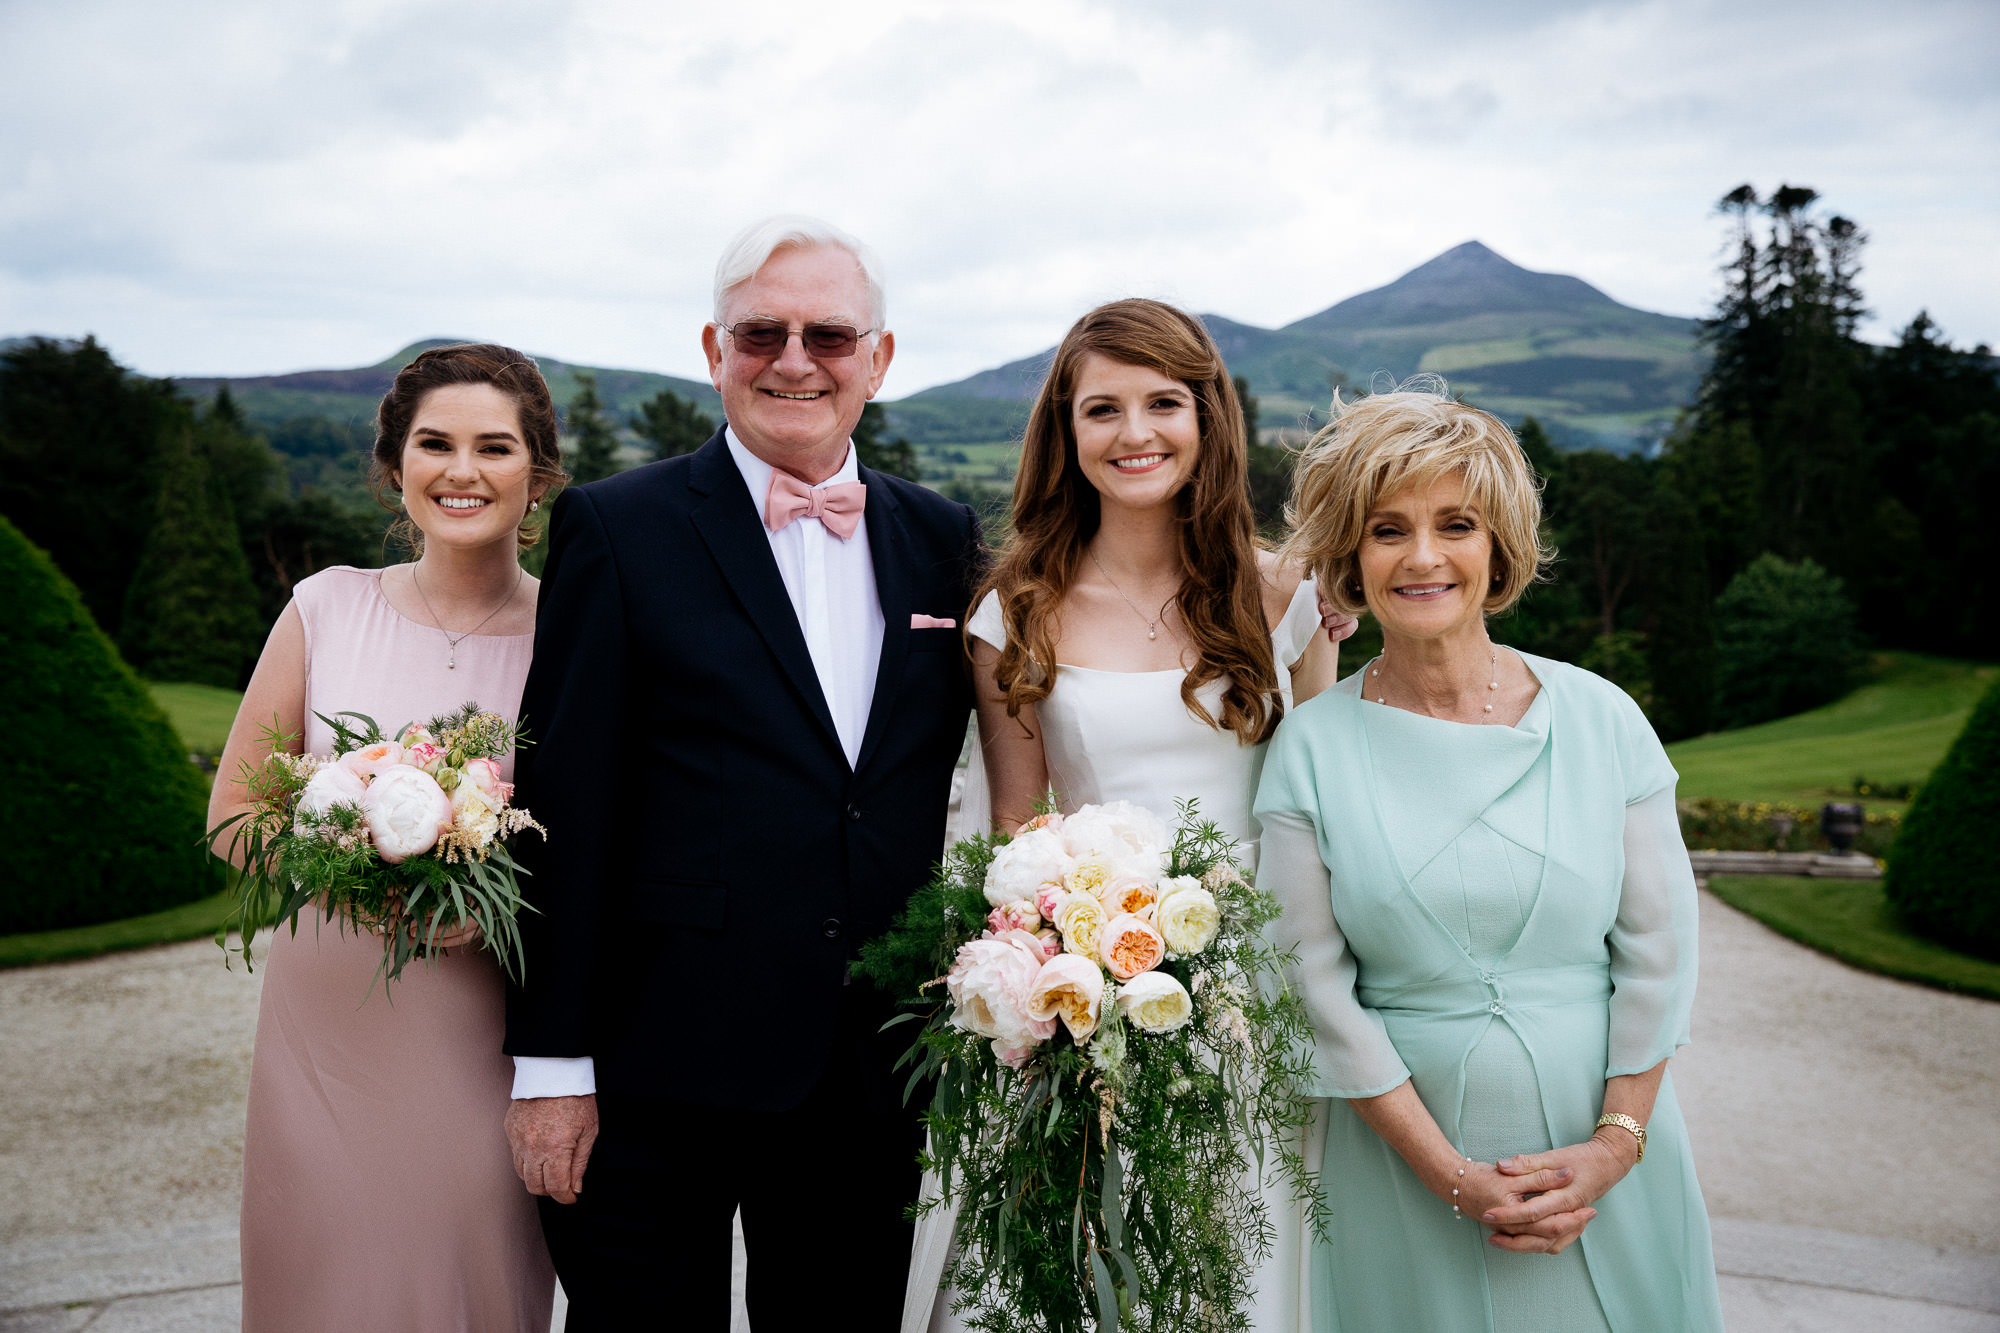 clairebyrnephotography-wedding-Emma-Max-3.jpg